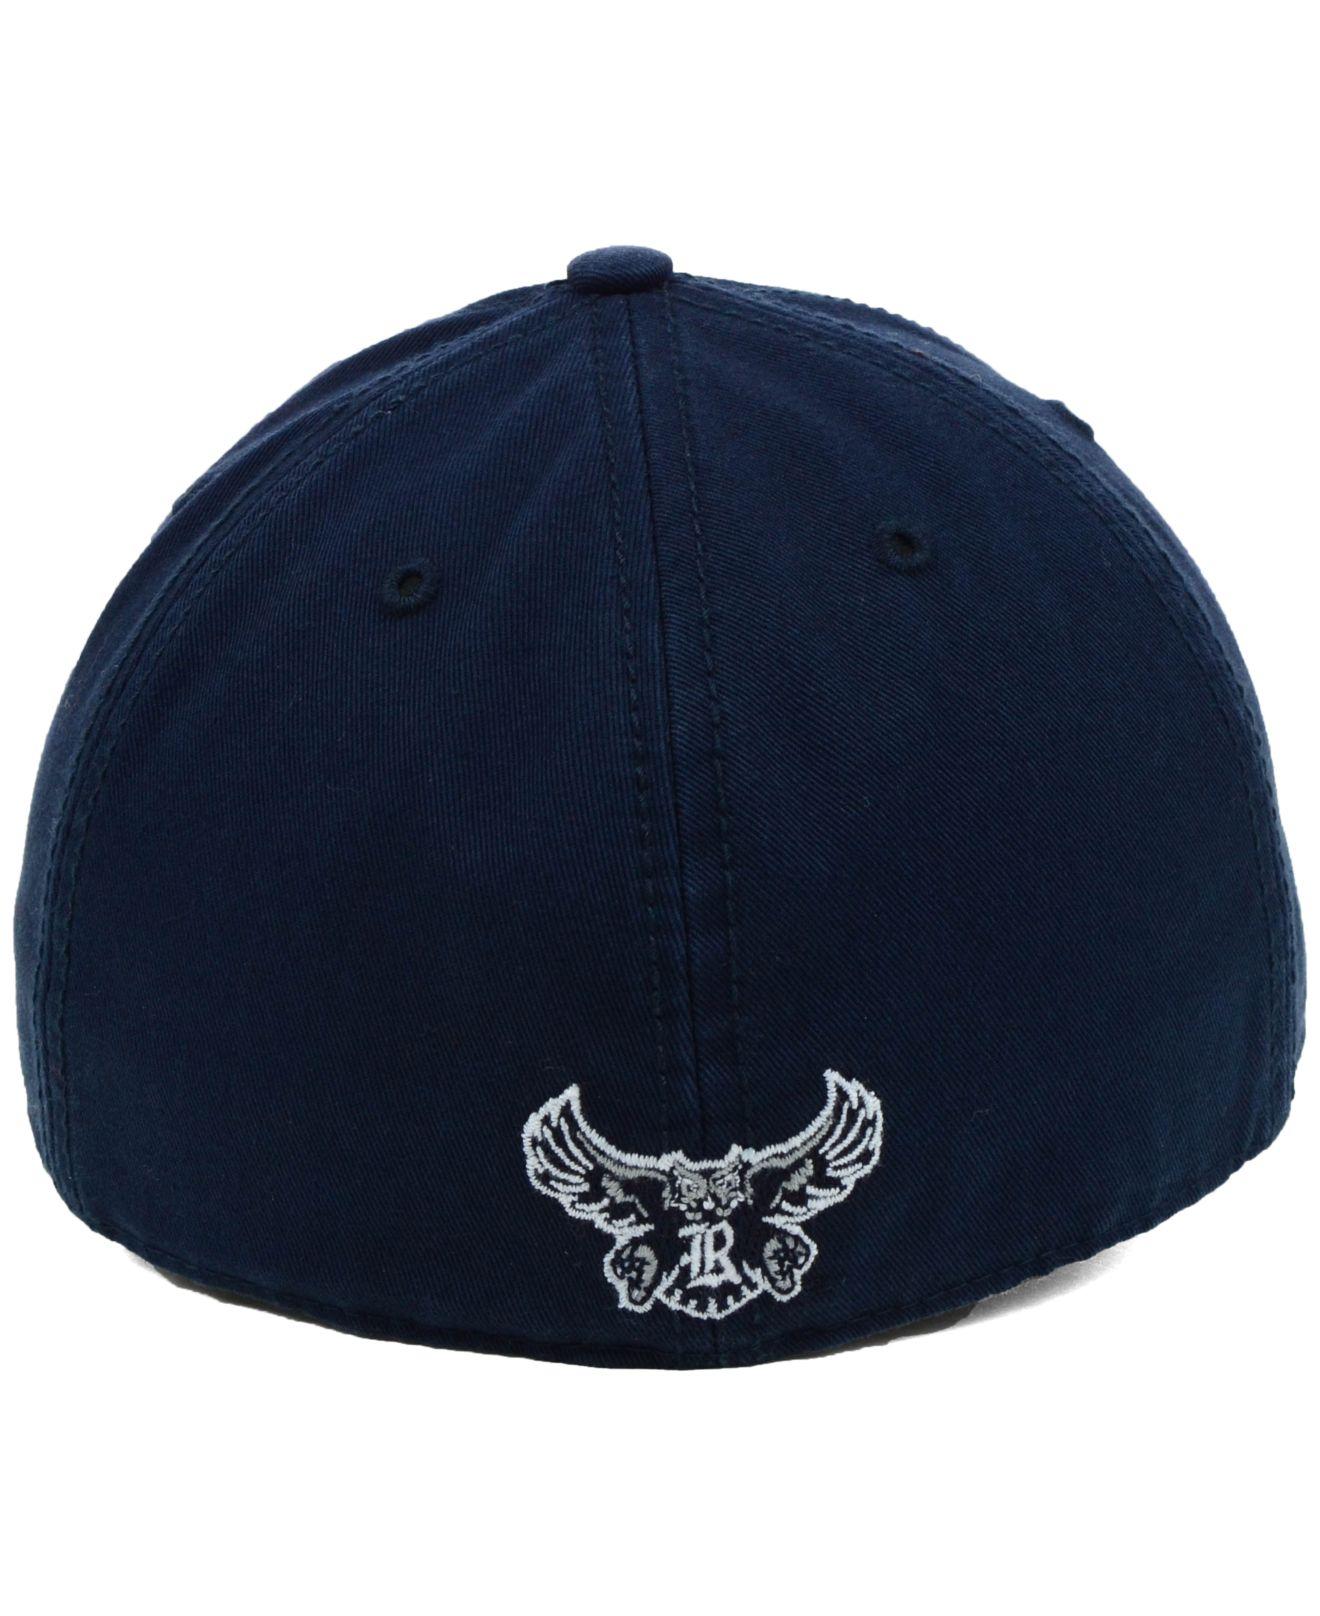 aa4af0309c27c Lyst - 47 Brand Rice Owls Vip Franchise Cap in Blue for Men